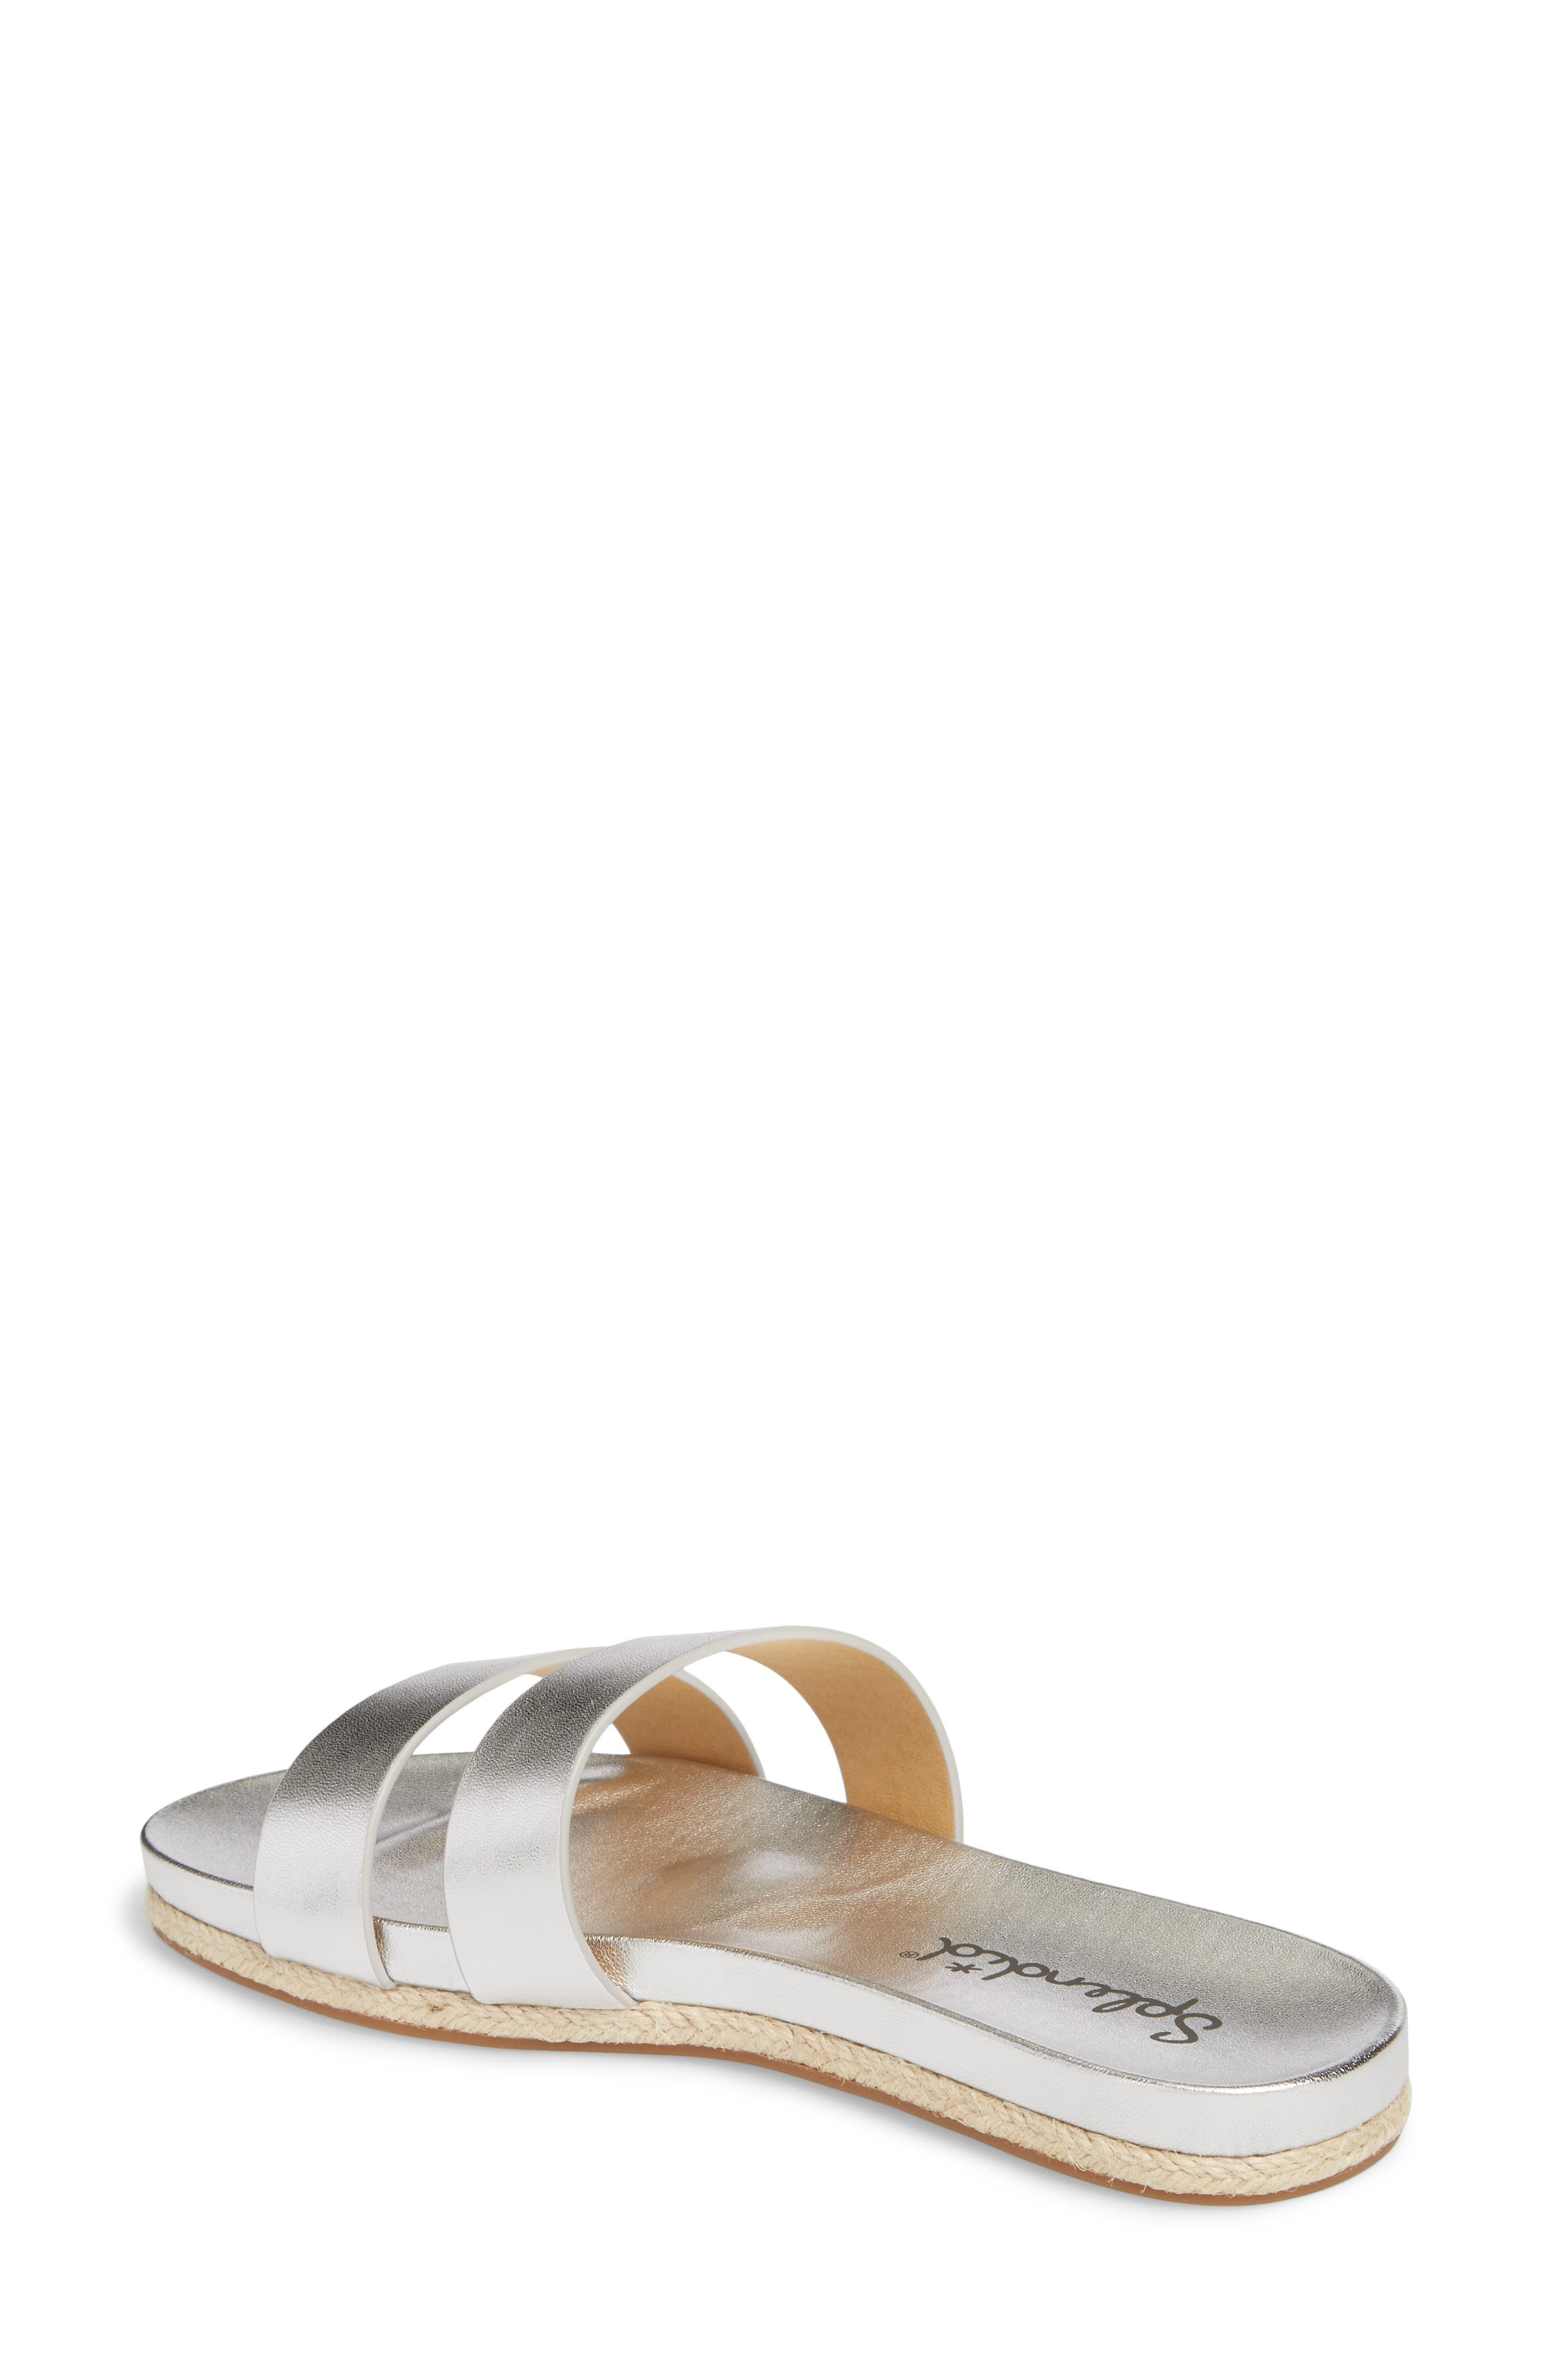 Brittani Slide Sandal,                             Alternate thumbnail 2, color,                             Silver Metallic Leather